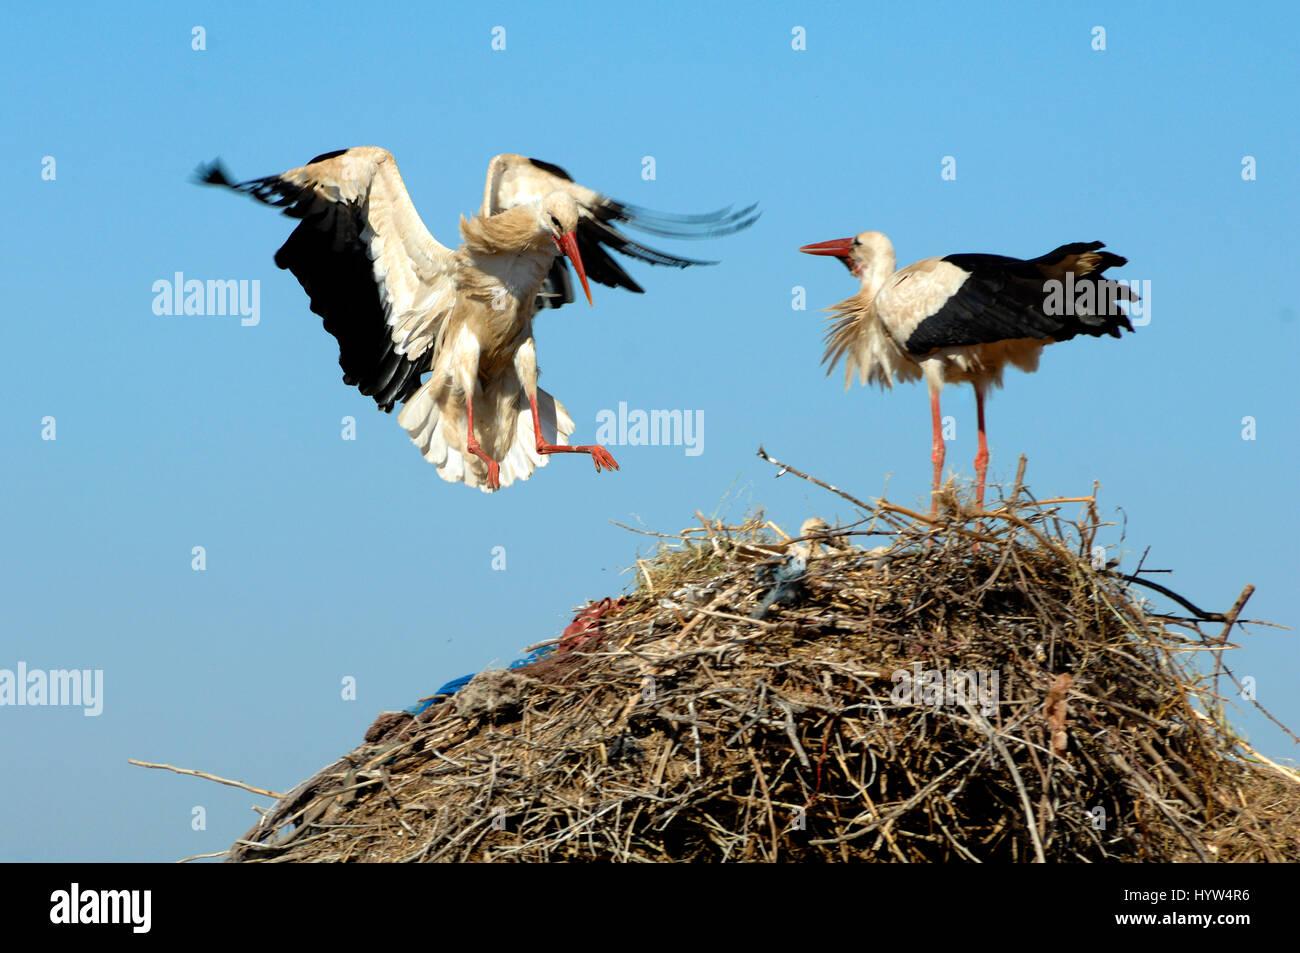 Cigogne blanche Ciconia ciconia, atterrissage, sur son nid Banque D'Images